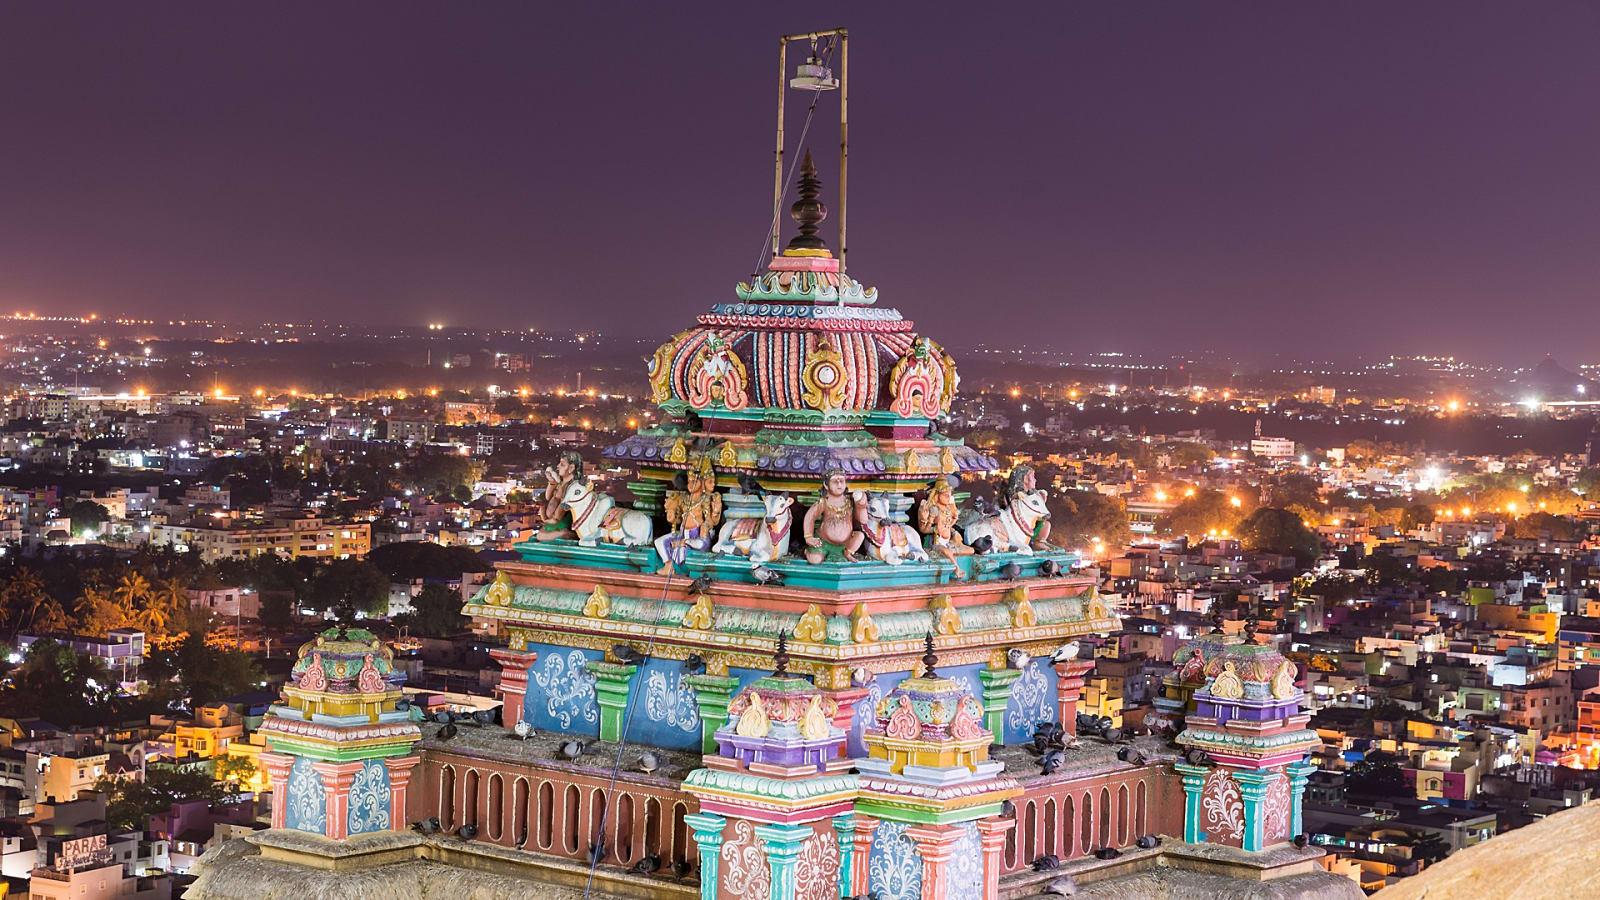 PunjabKesari, तिरुचिरापल्ली इमेज, Tiruchirappalli image